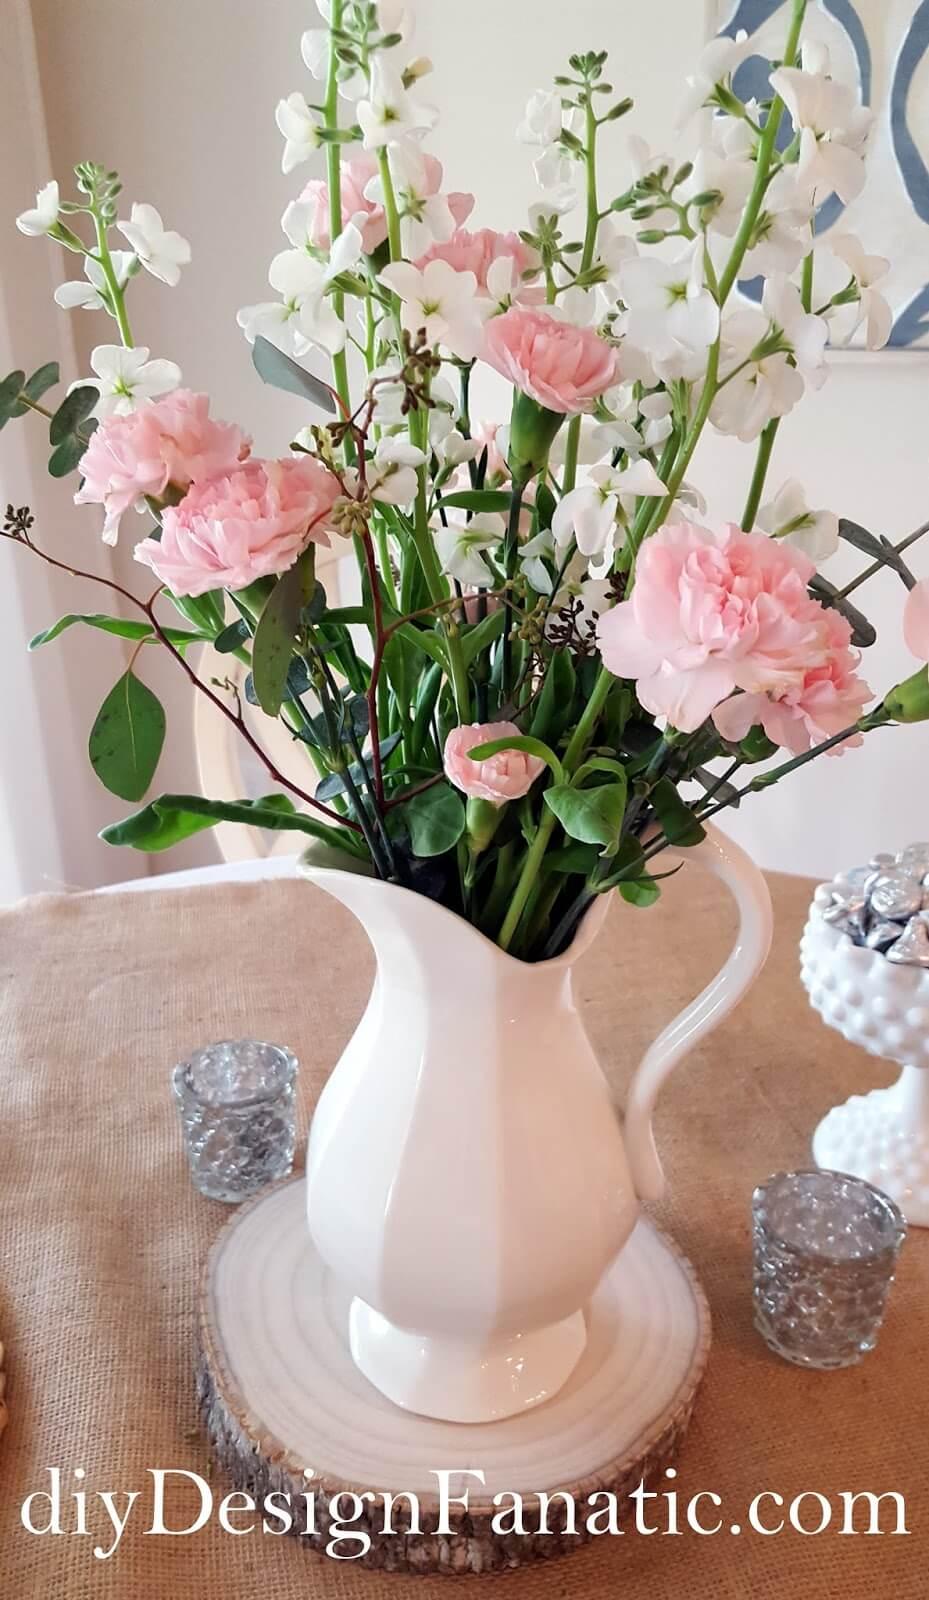 Flowers in Pink, Jug in White